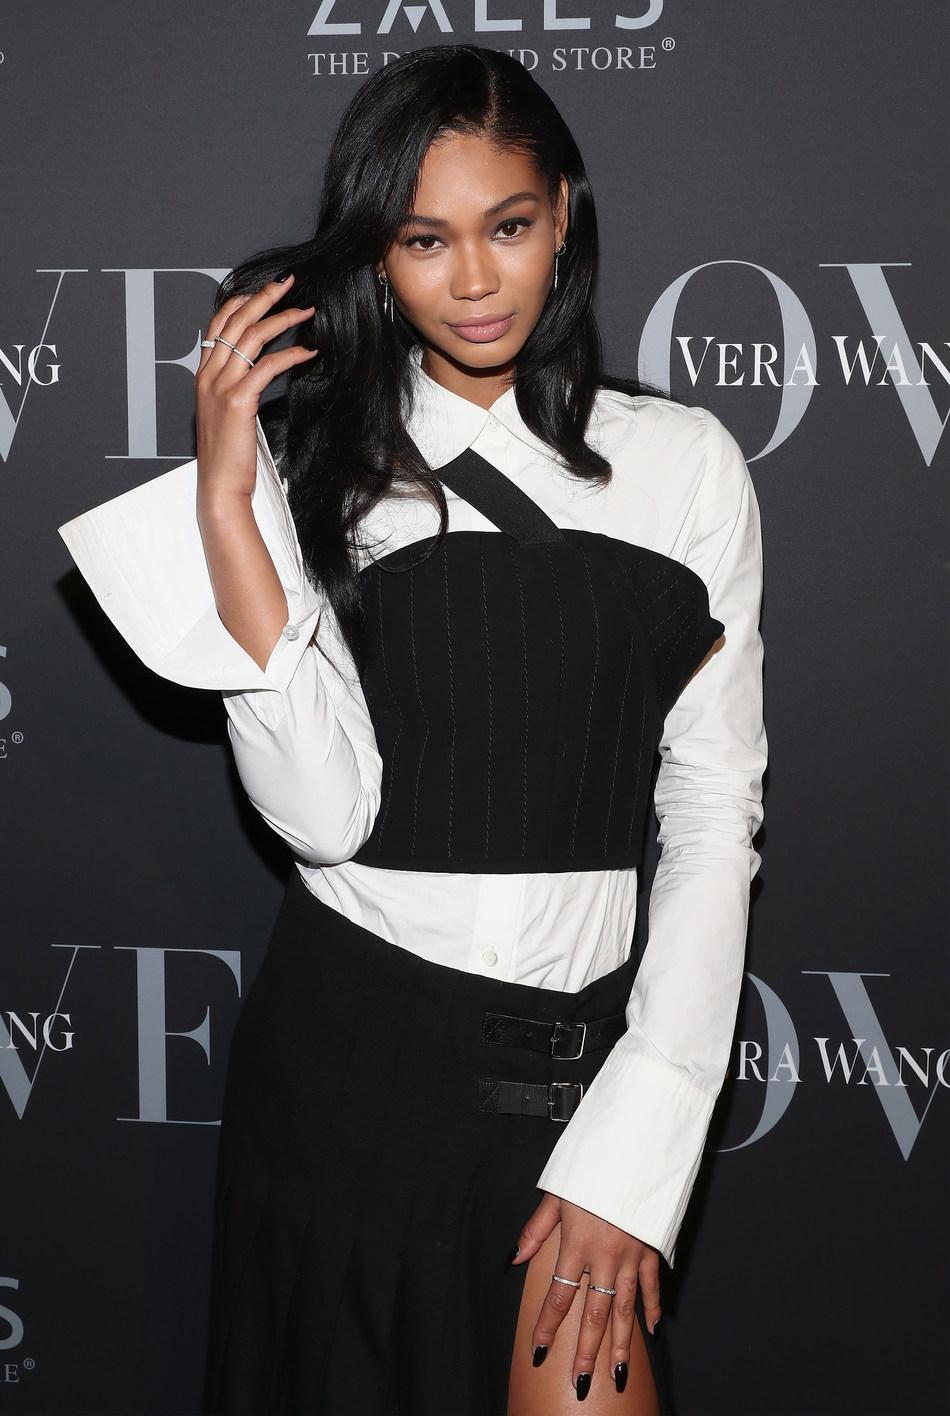 Zales Celebrates The Vera Wang Love Fashion Jewelry